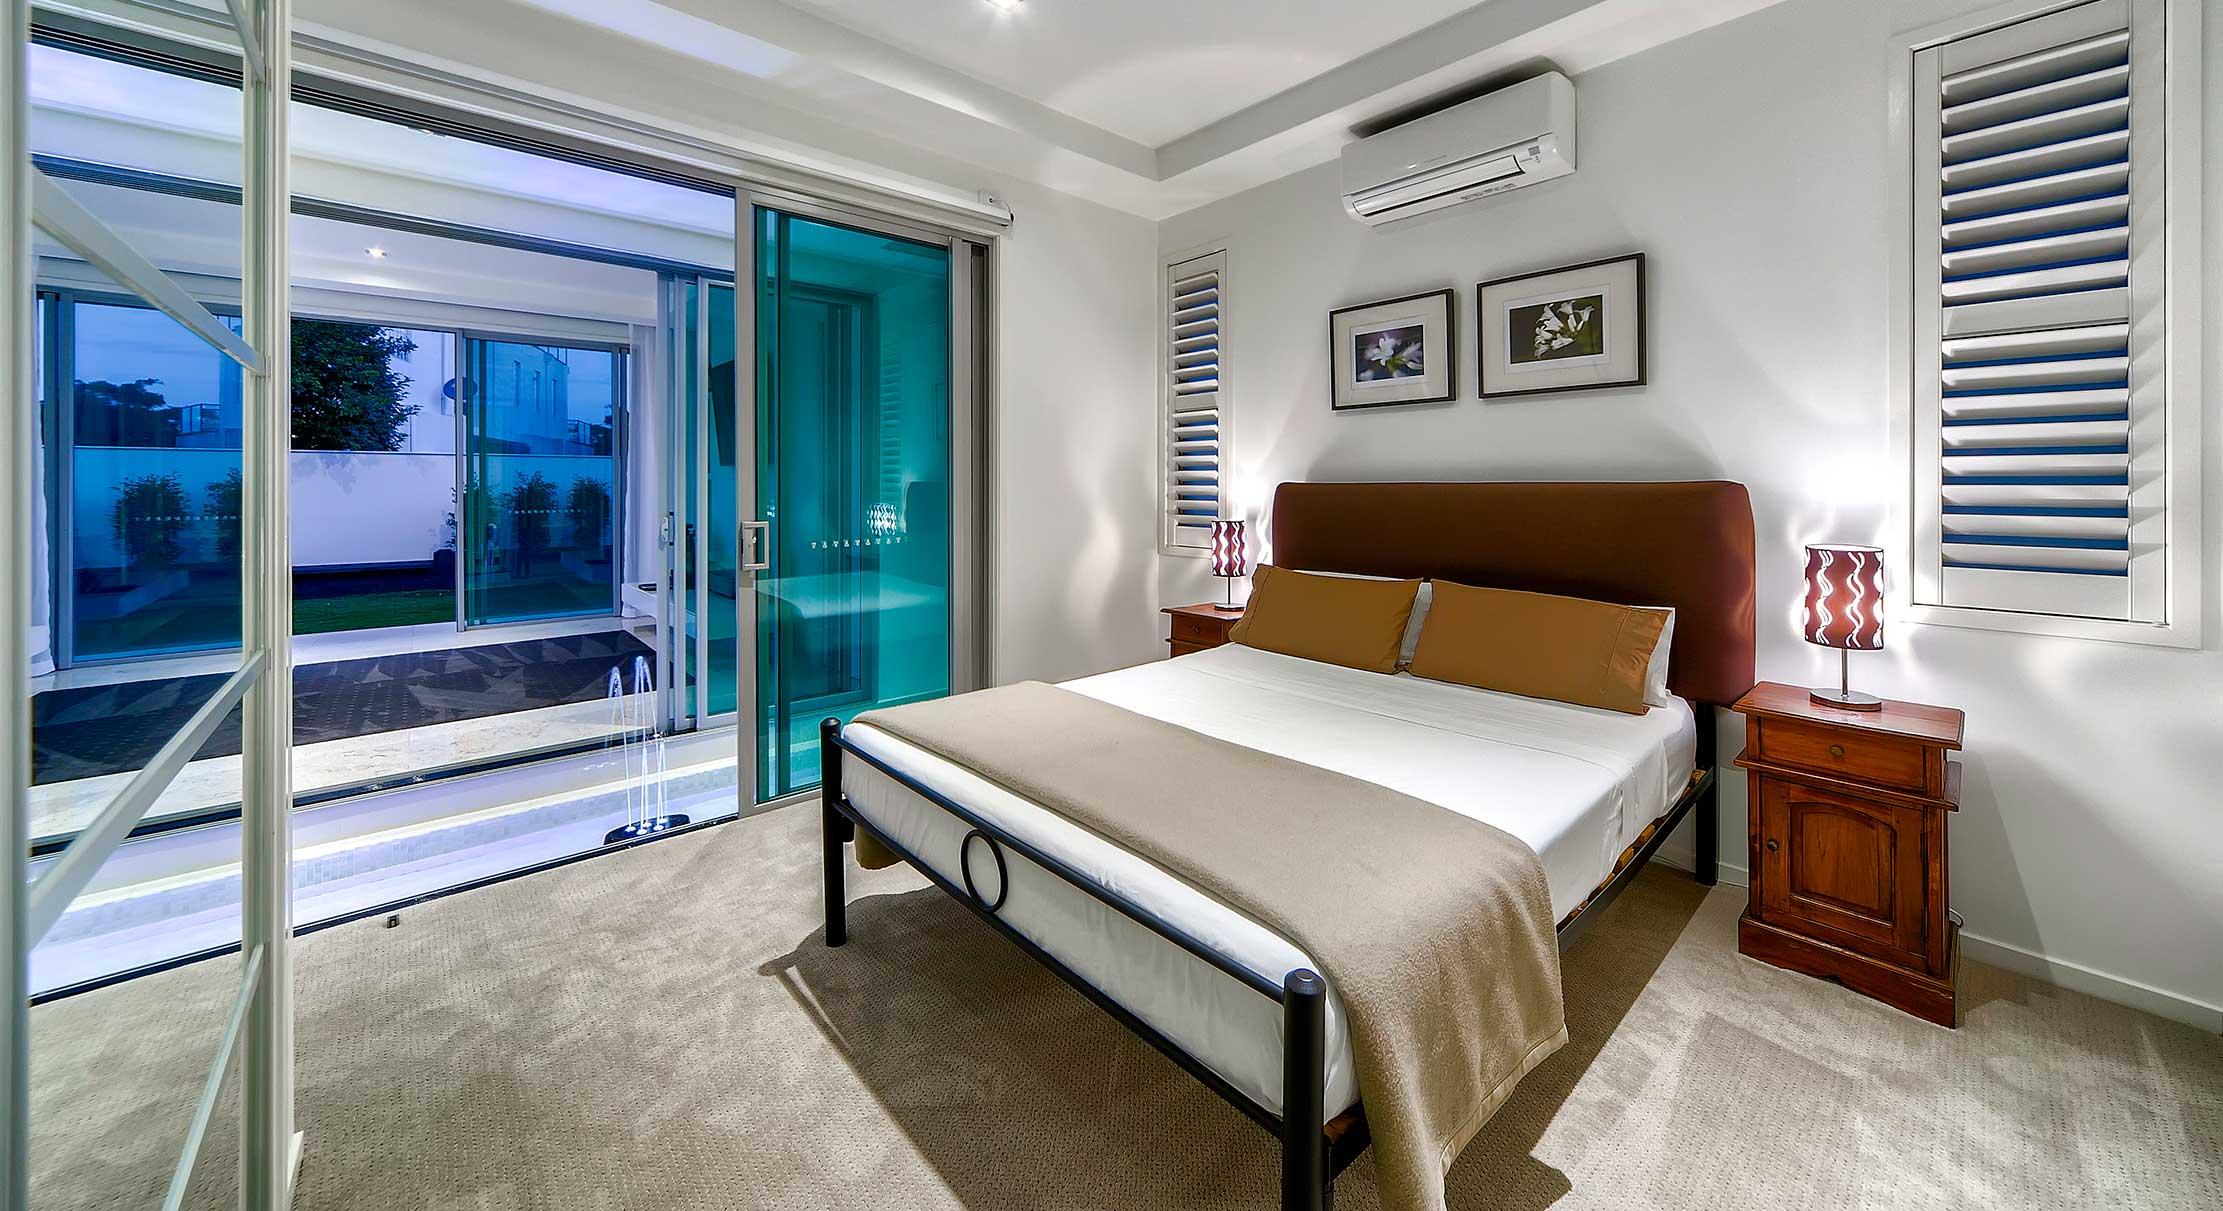 portfolio-1-slider-image-3-bedroom-hamilton-gary-cramb-constructions-brisbane